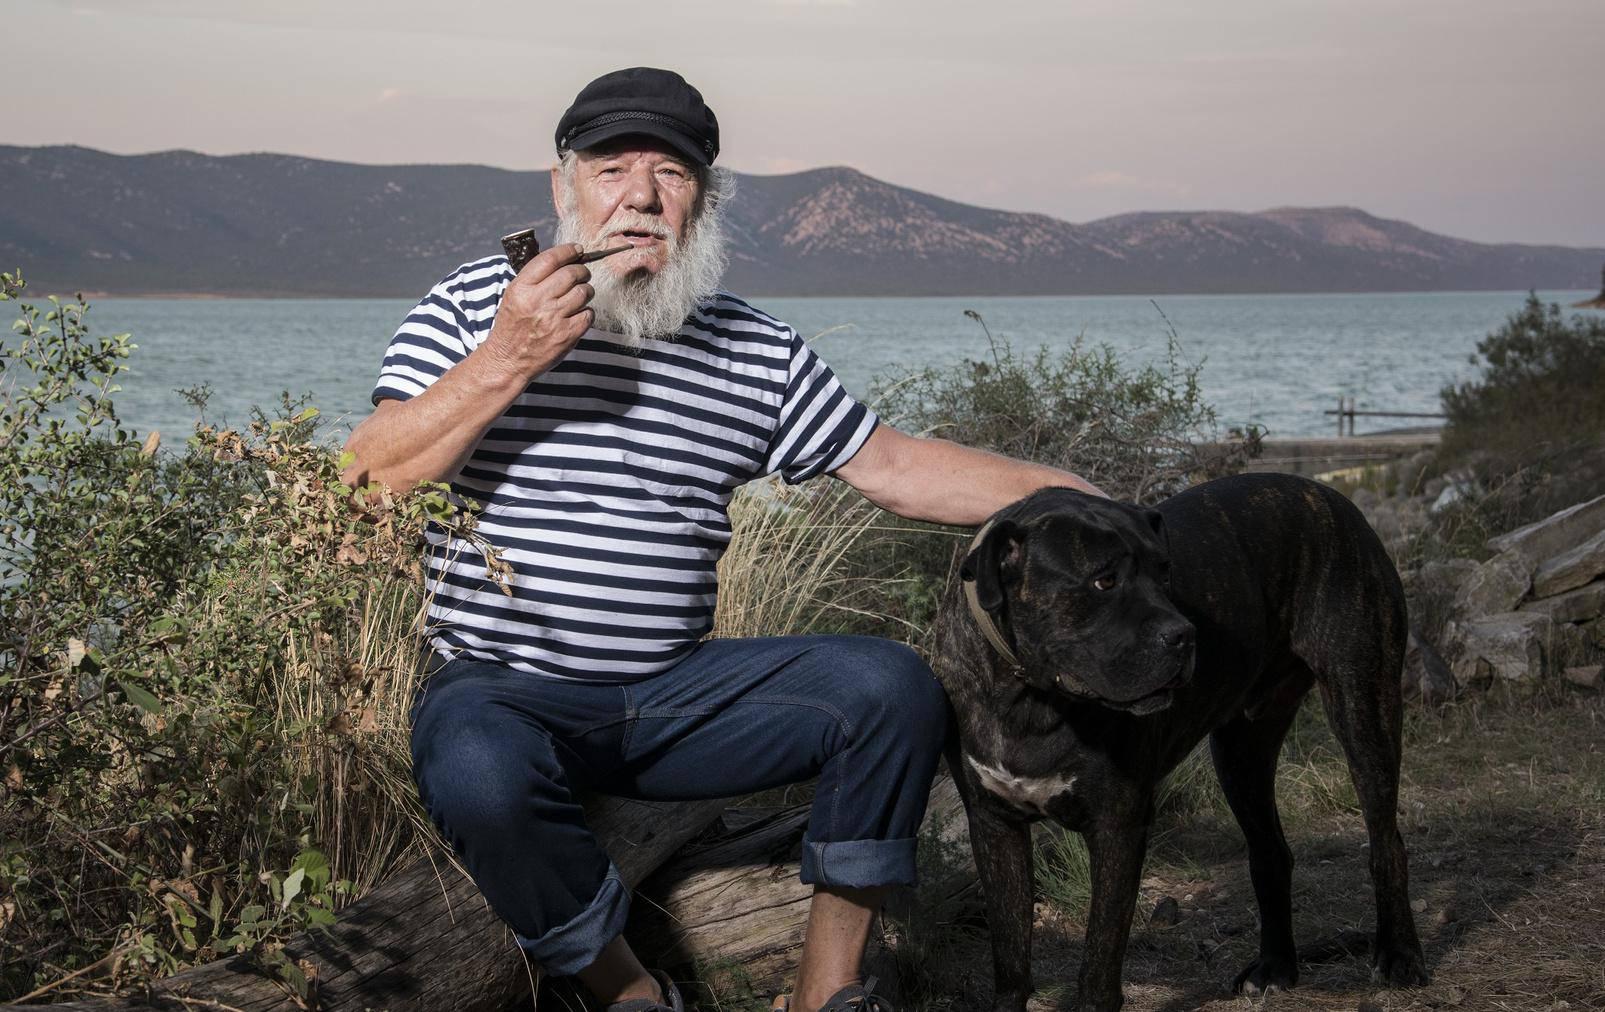 Barba Jure postao novi mentor u 'Farmi': Očekujem korektnost